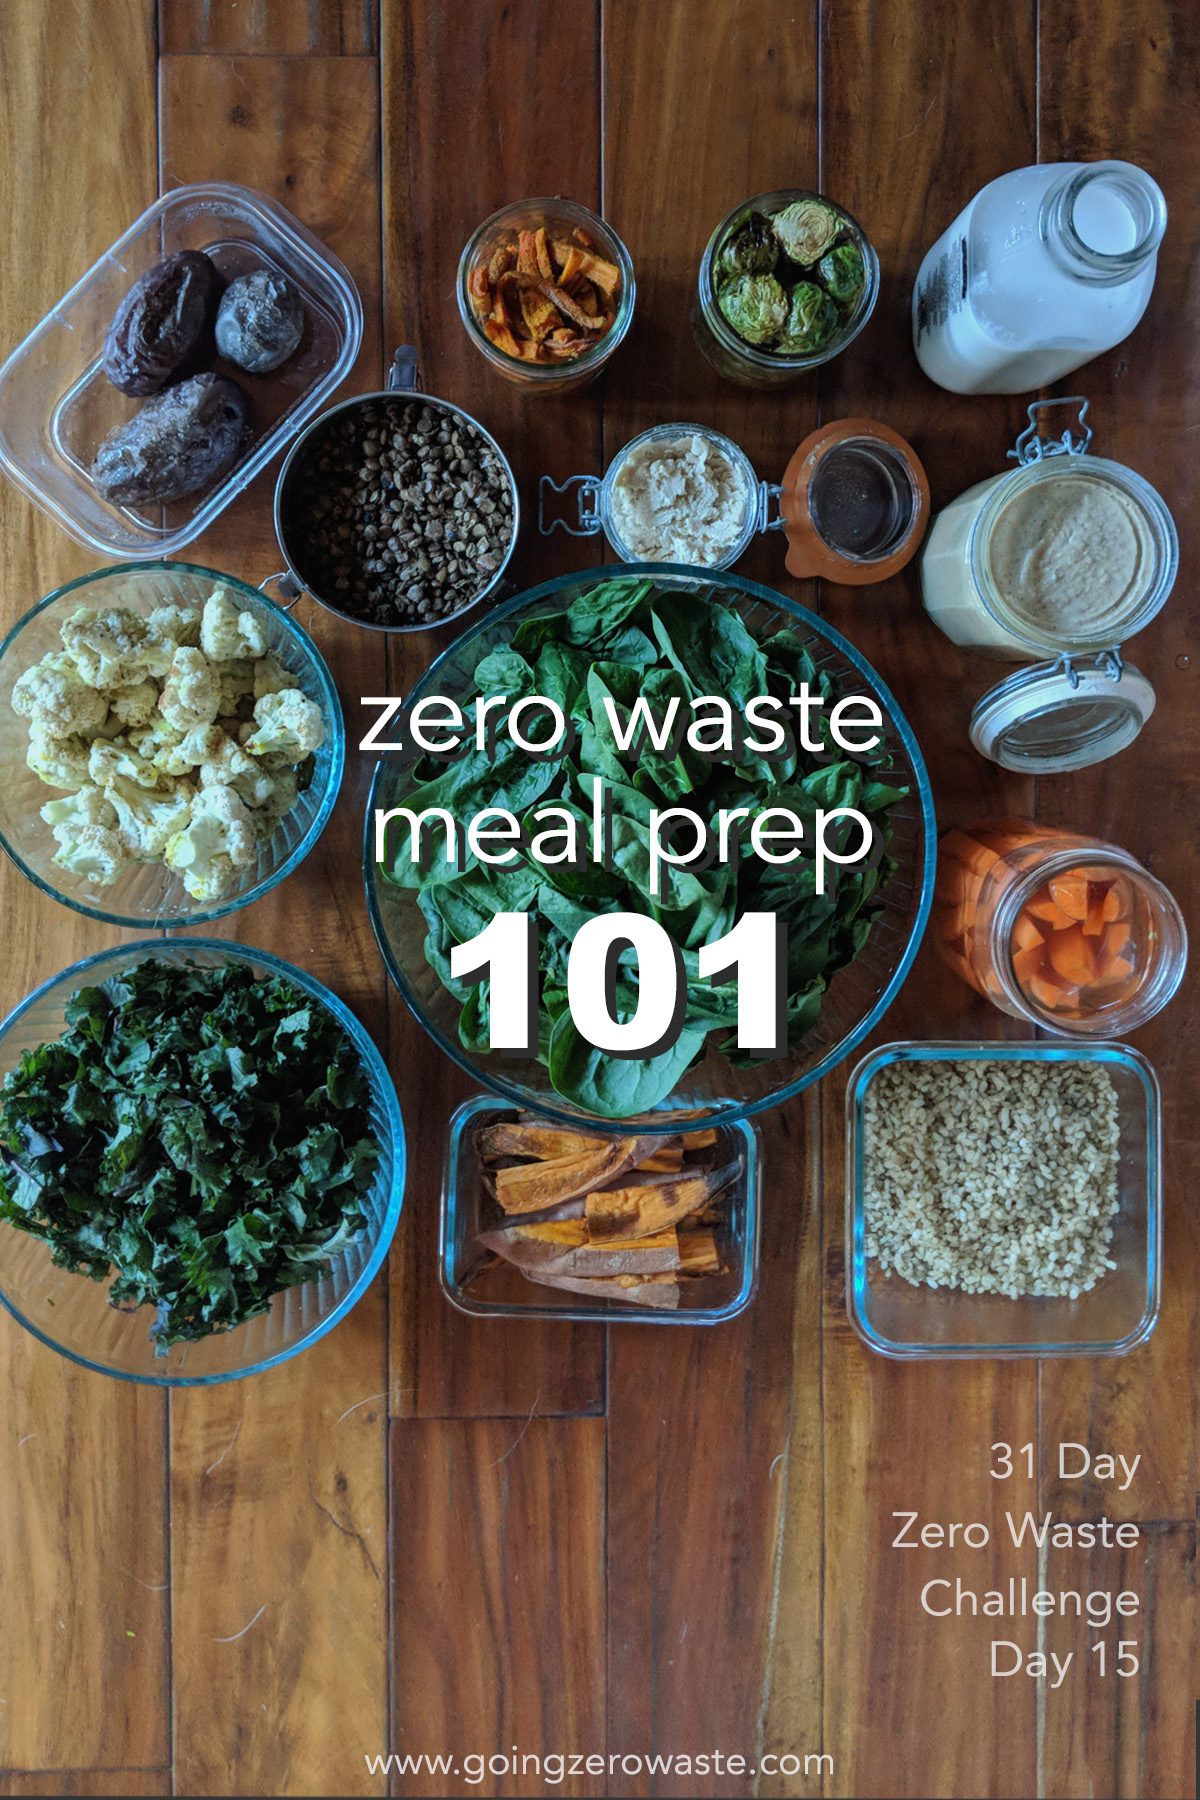 Zero waste meal prep 101 from www.goingzerowaste.com day 15 of the zero waste challenge #ecofriendly #zerowastechallenge #mealprep